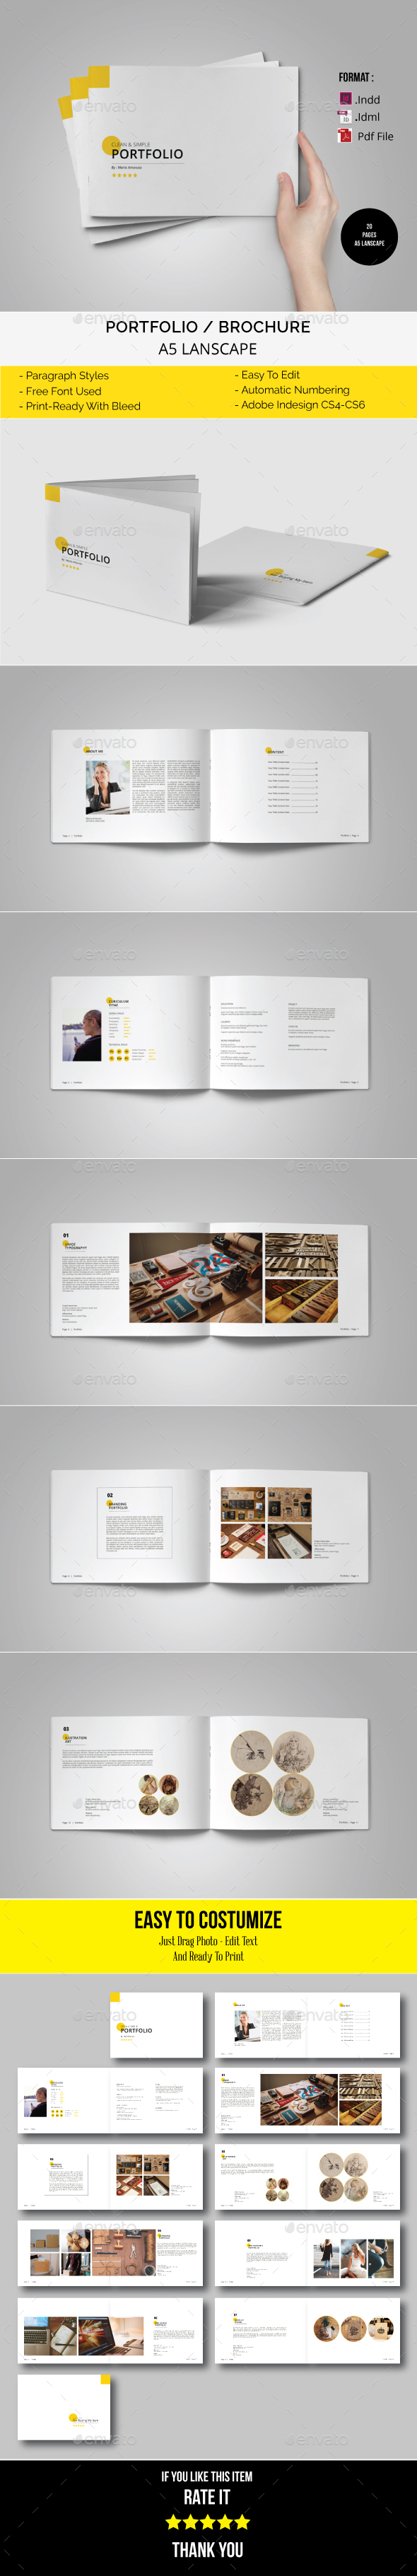 A5 Lanscape Brochure / Portfolio - Portfolio Brochures